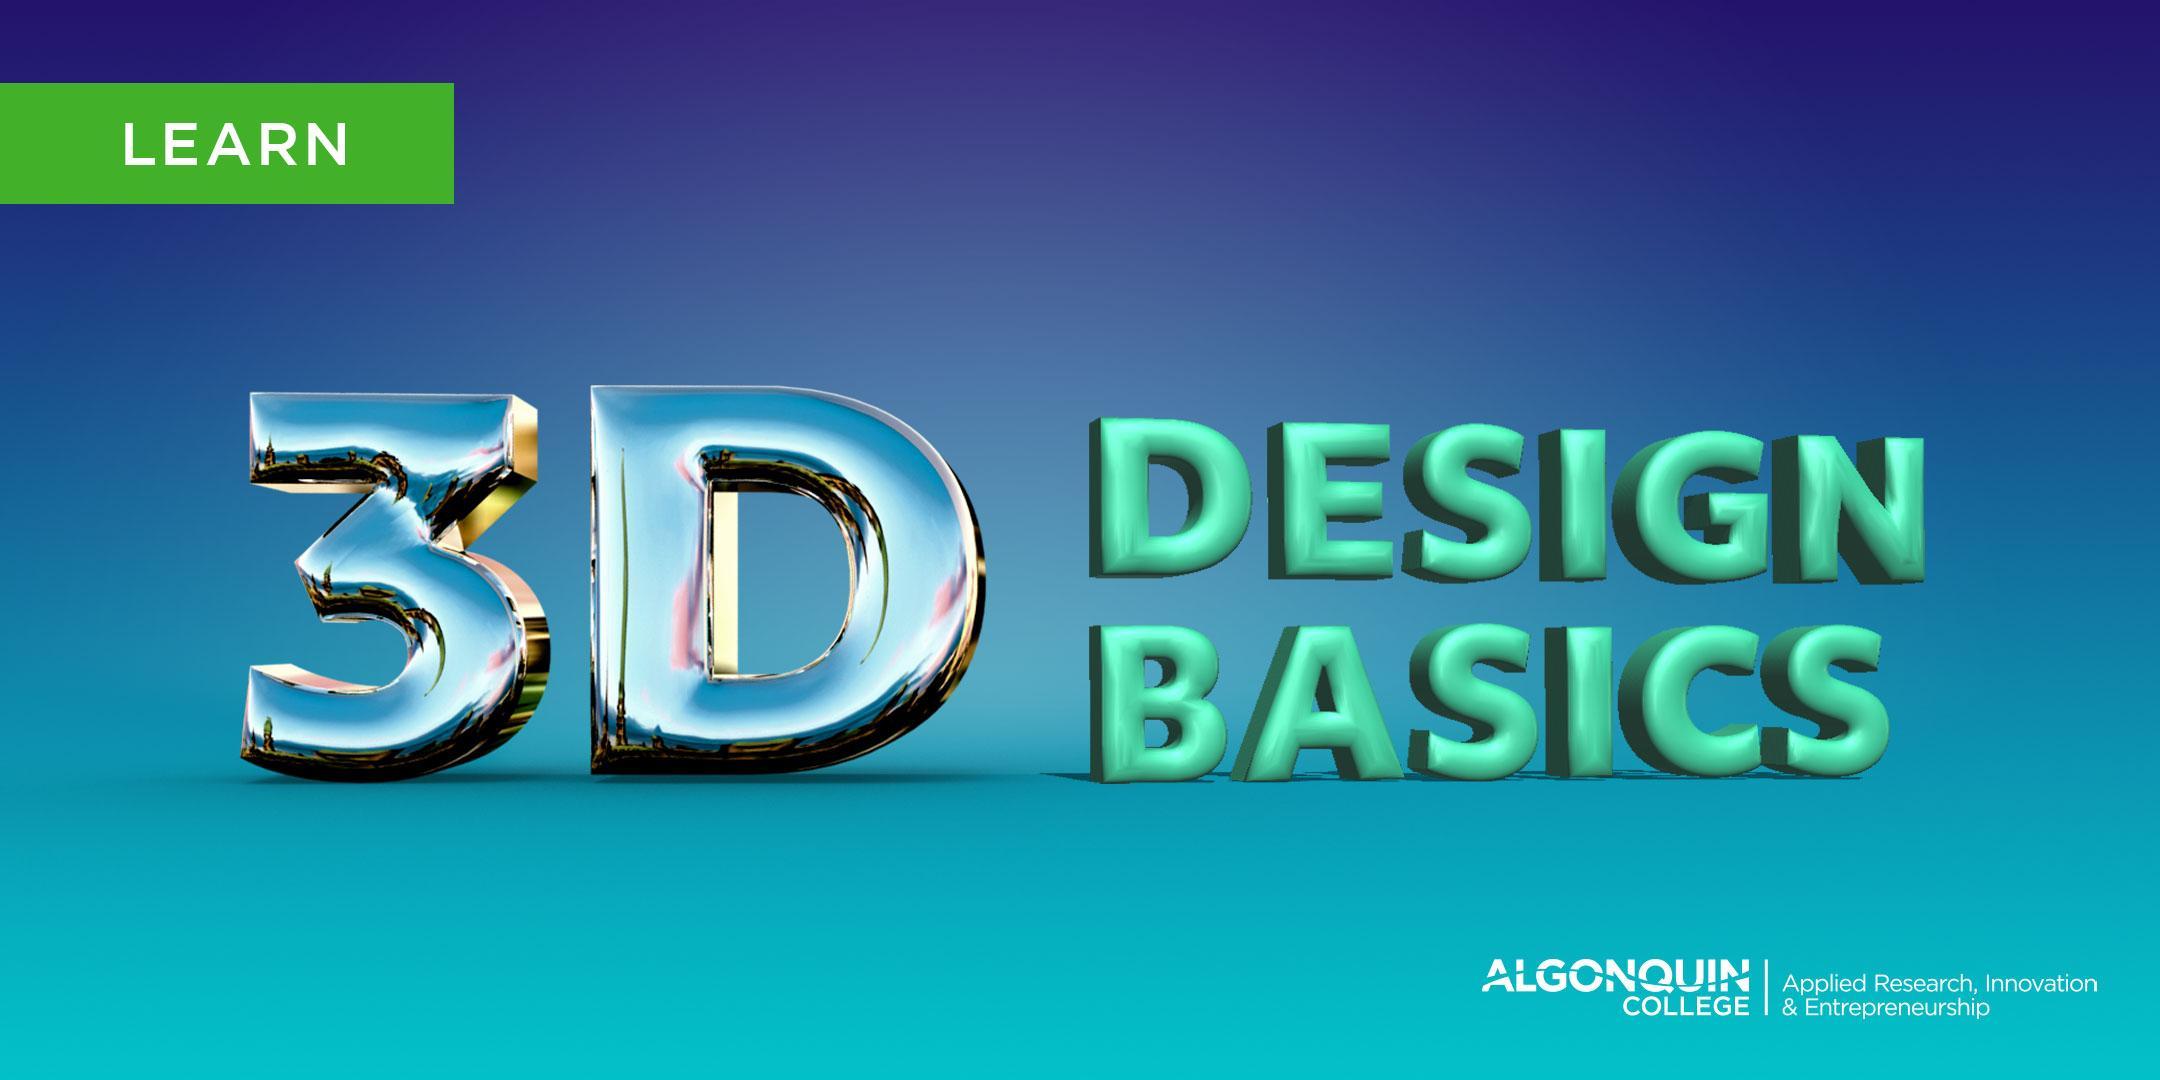 Algonquin College MakerSpace: 3D Design Basics